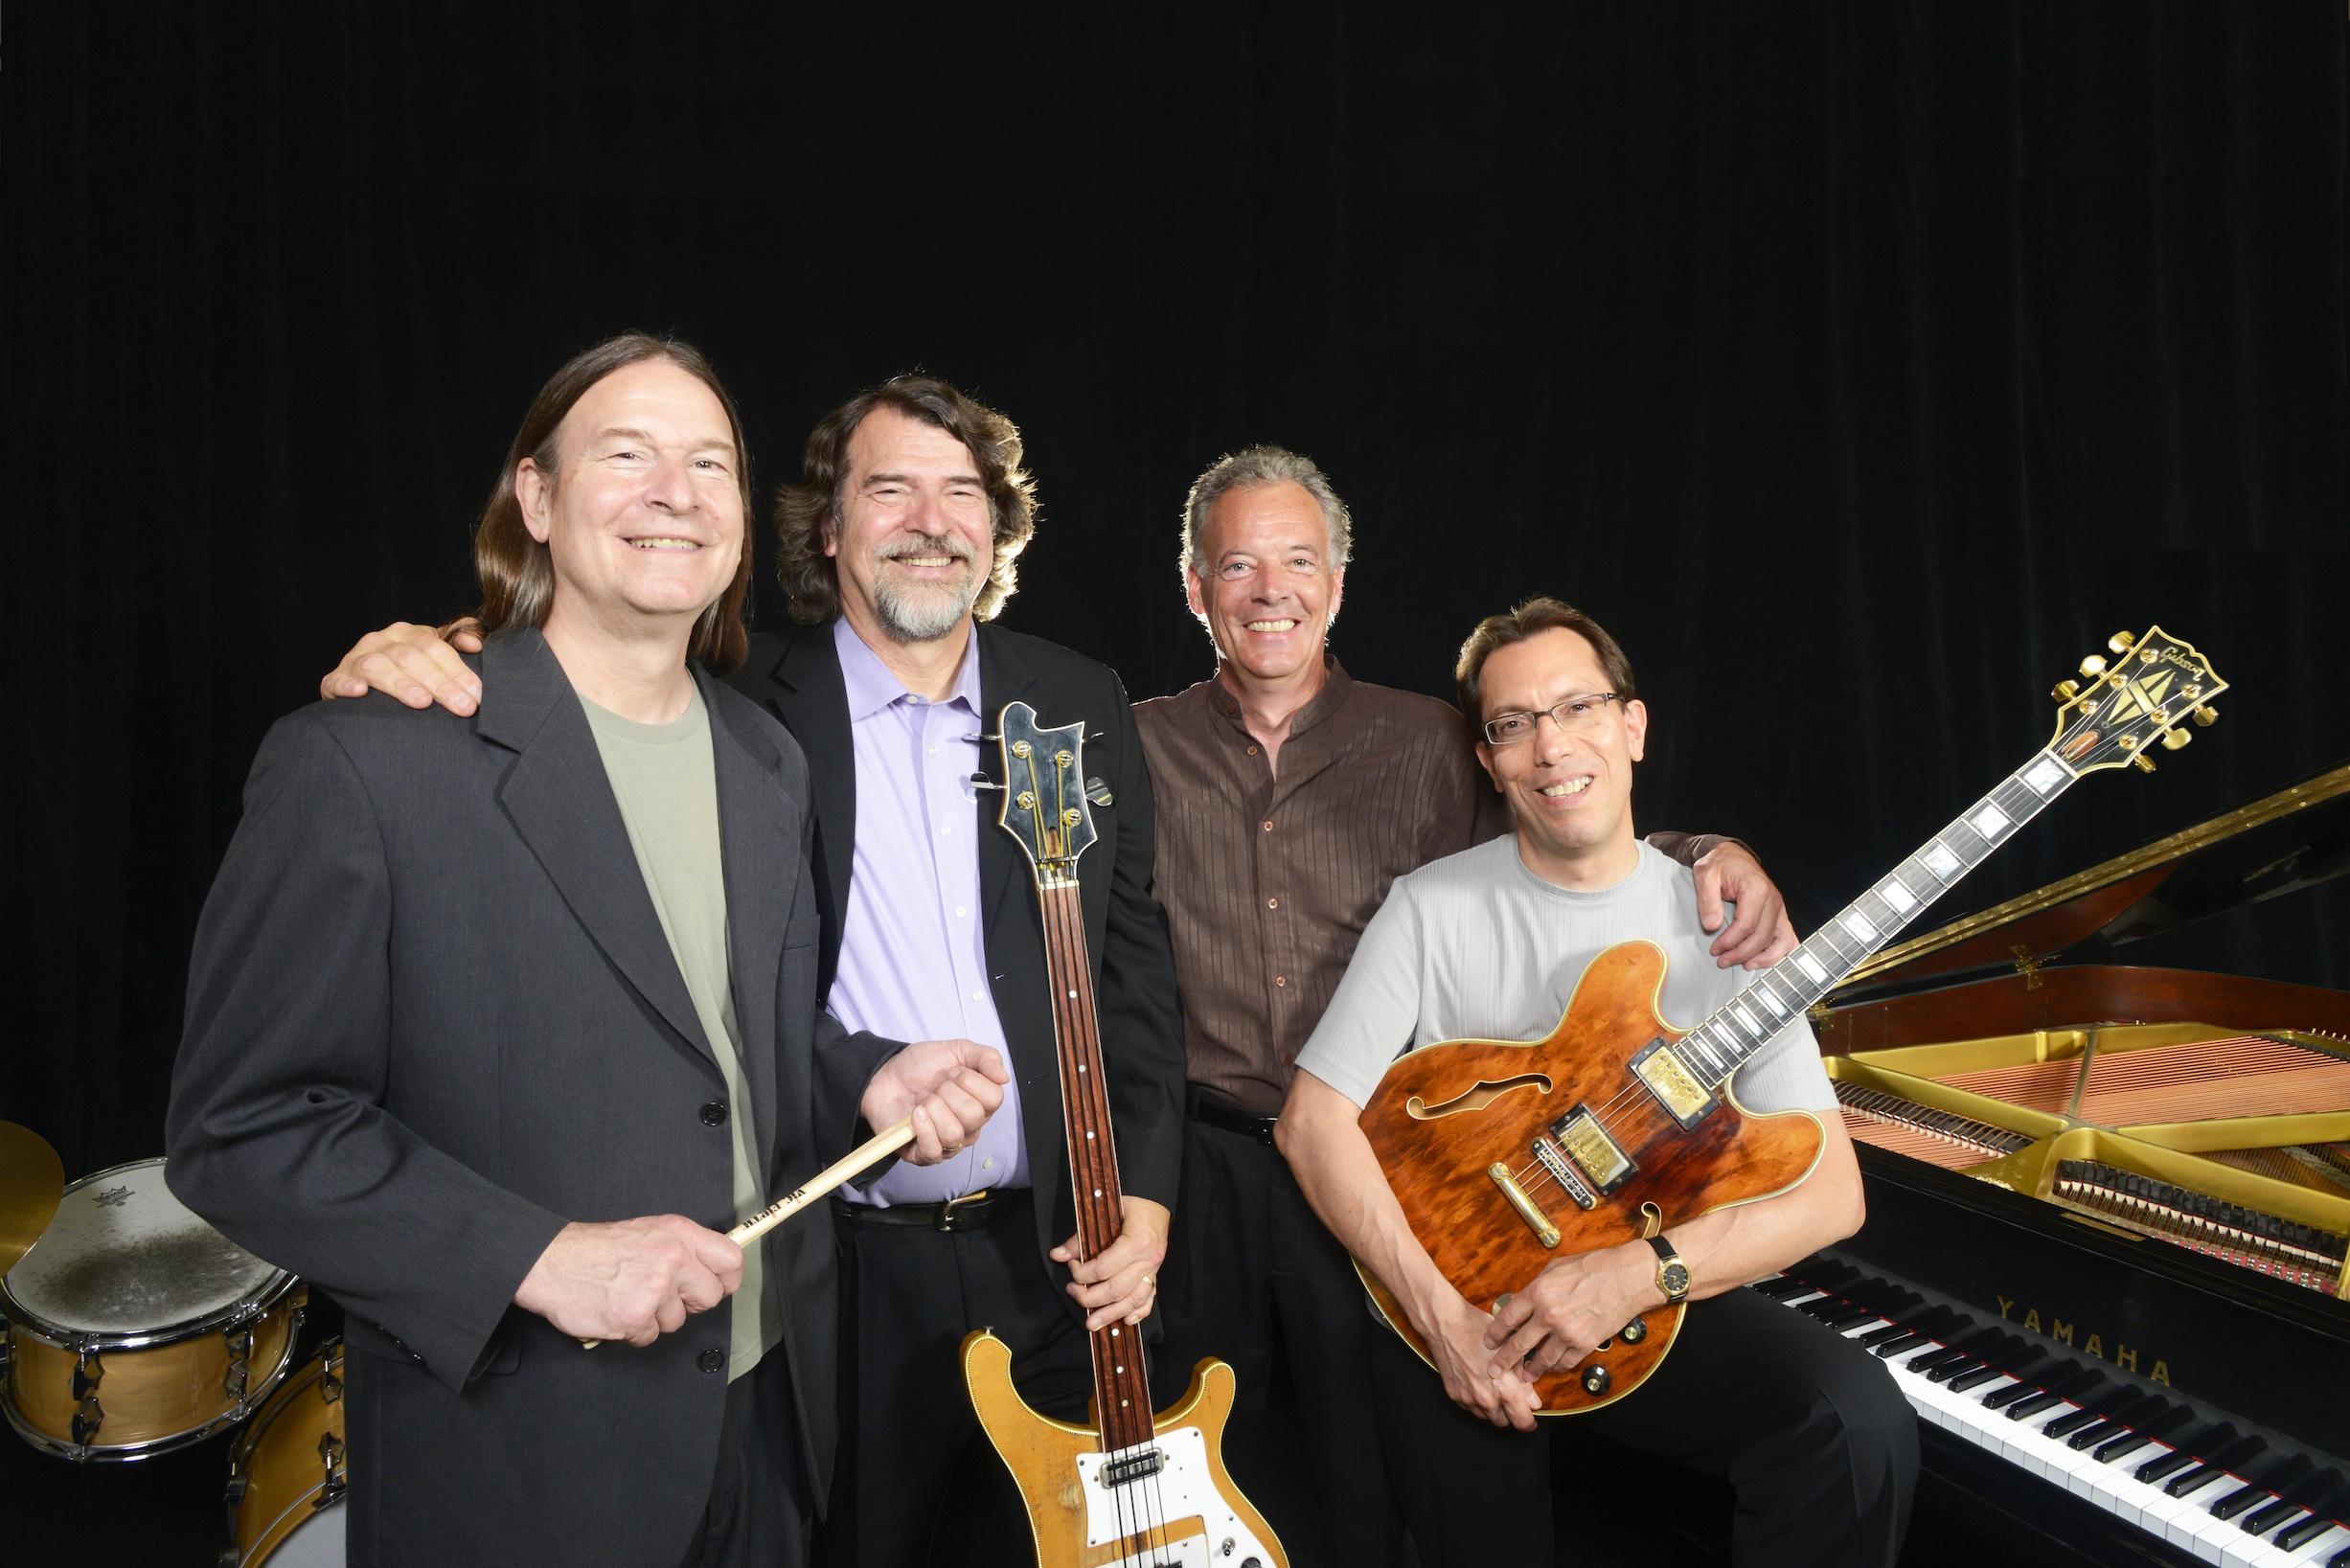 Brubeck Brothers Quartet At The Franklin Center